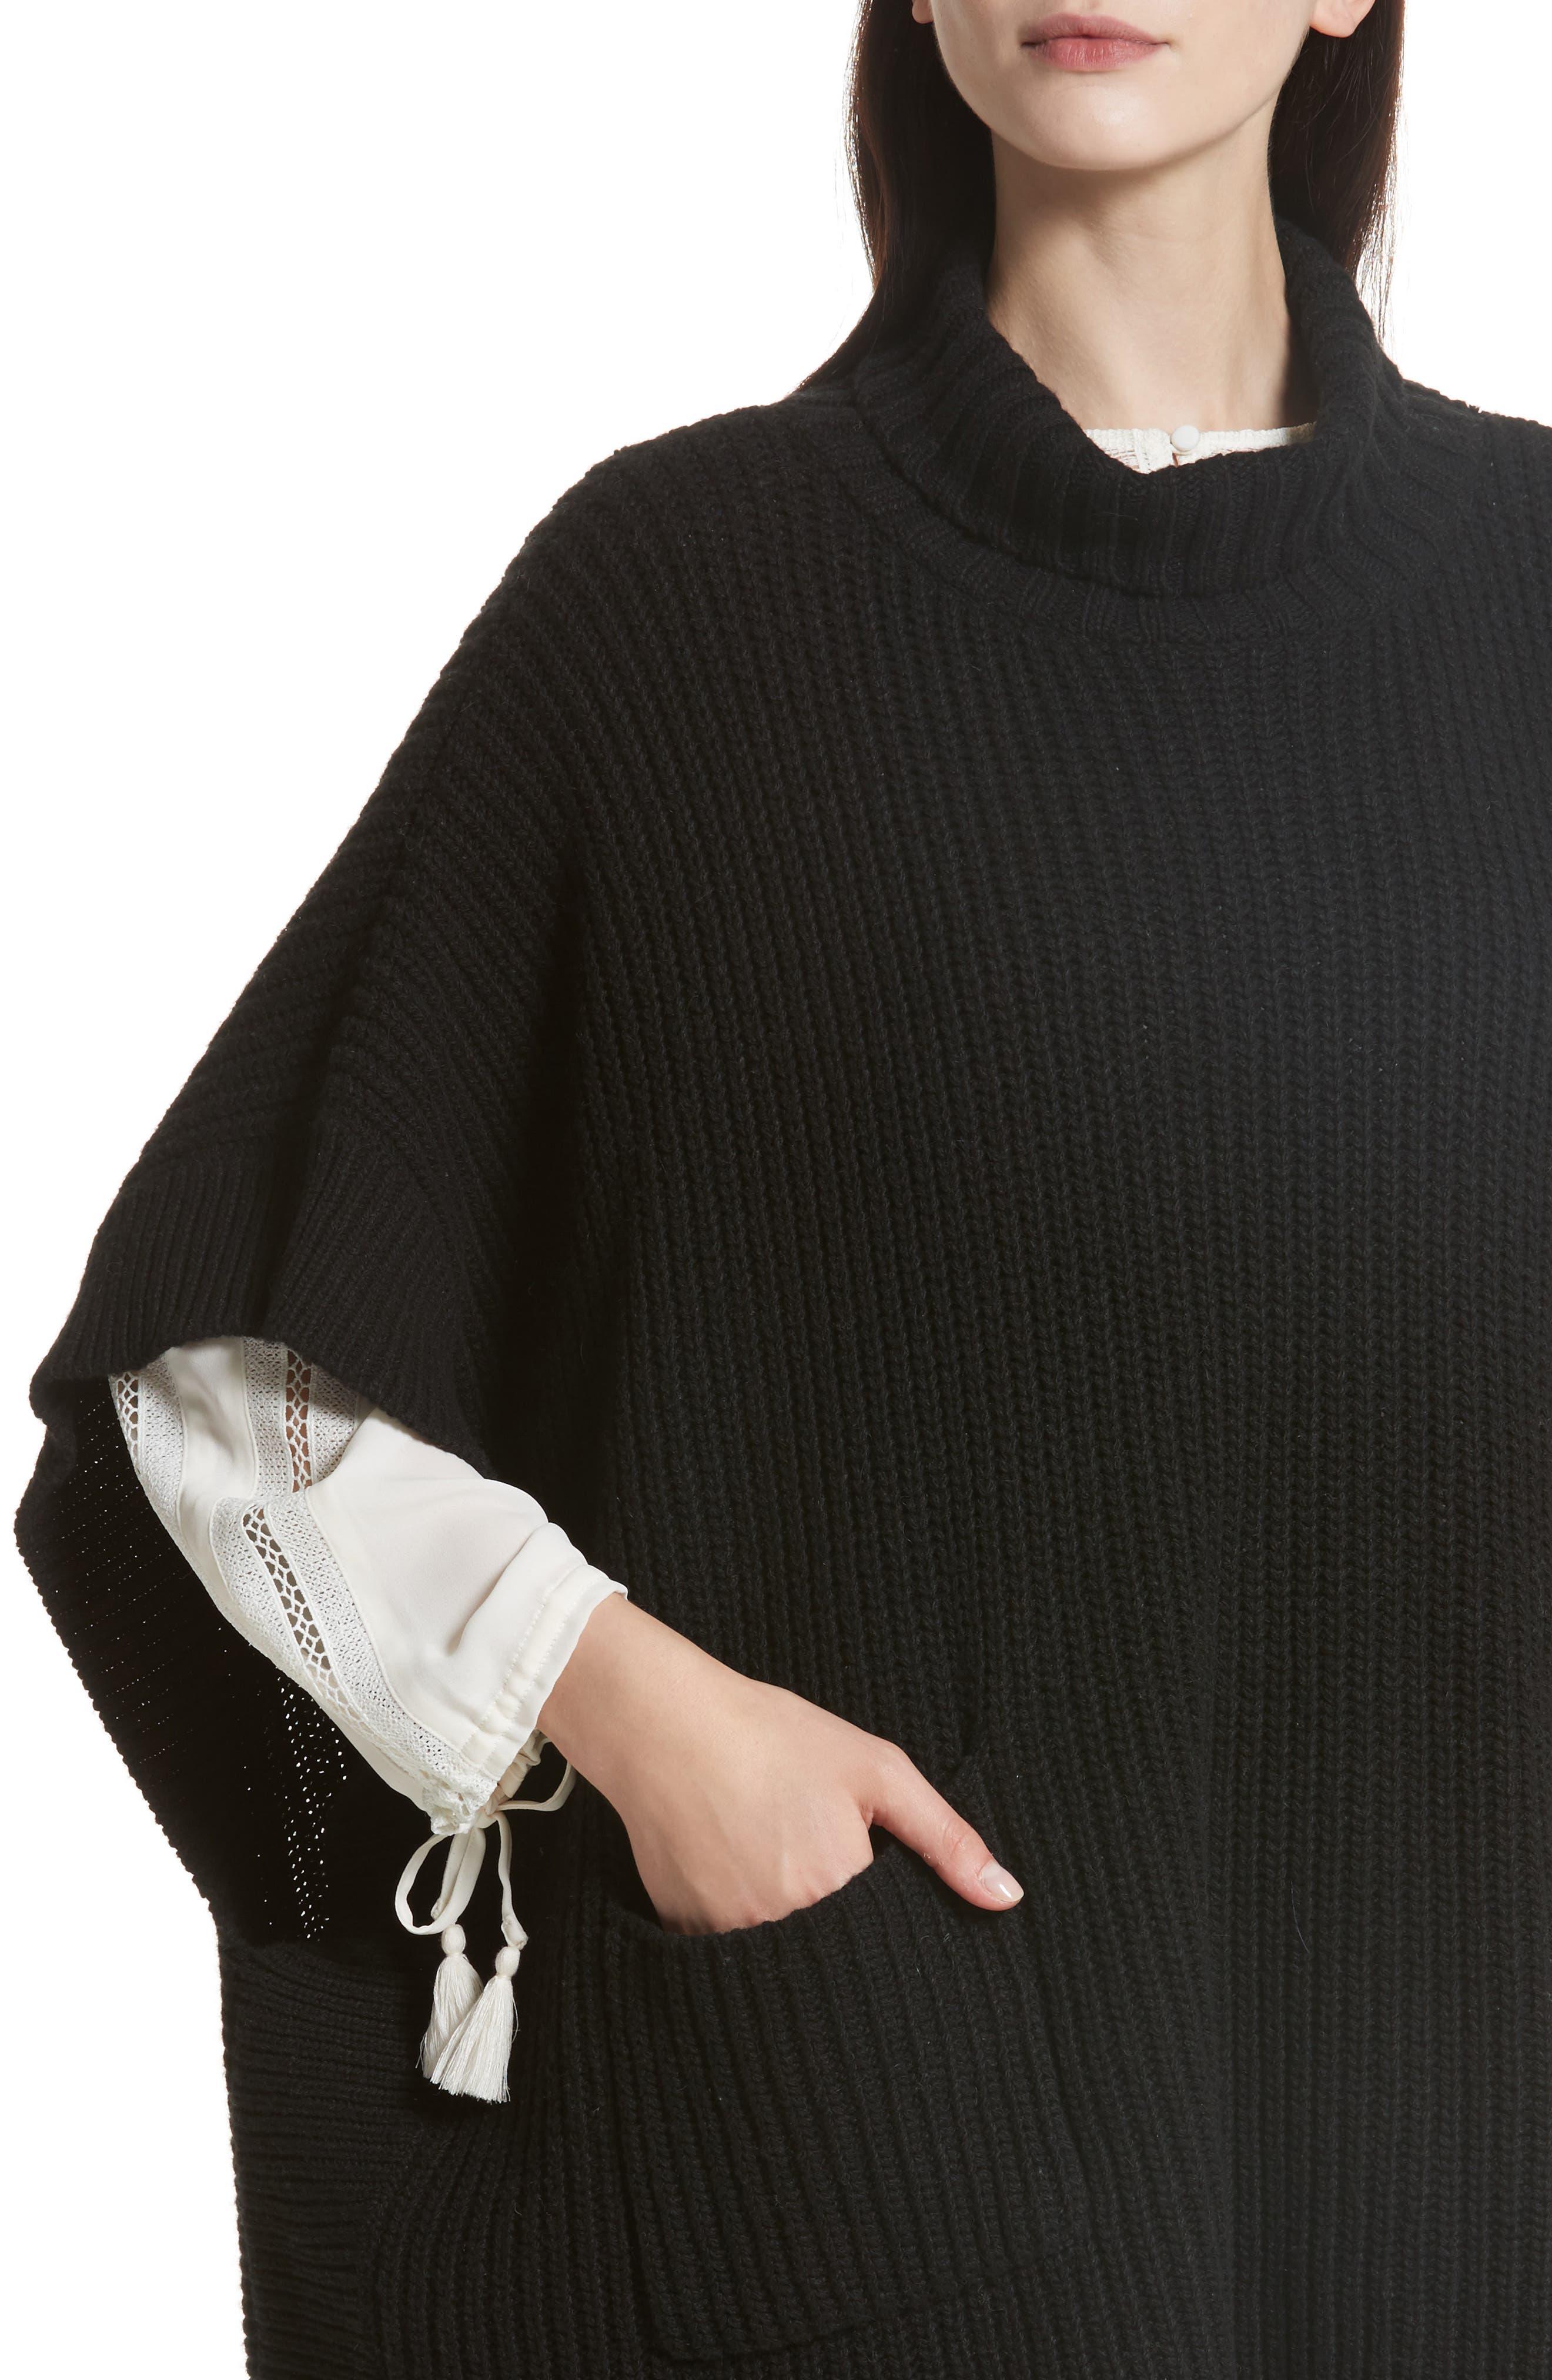 Serina Oversize Sweater,                             Alternate thumbnail 4, color,                             007